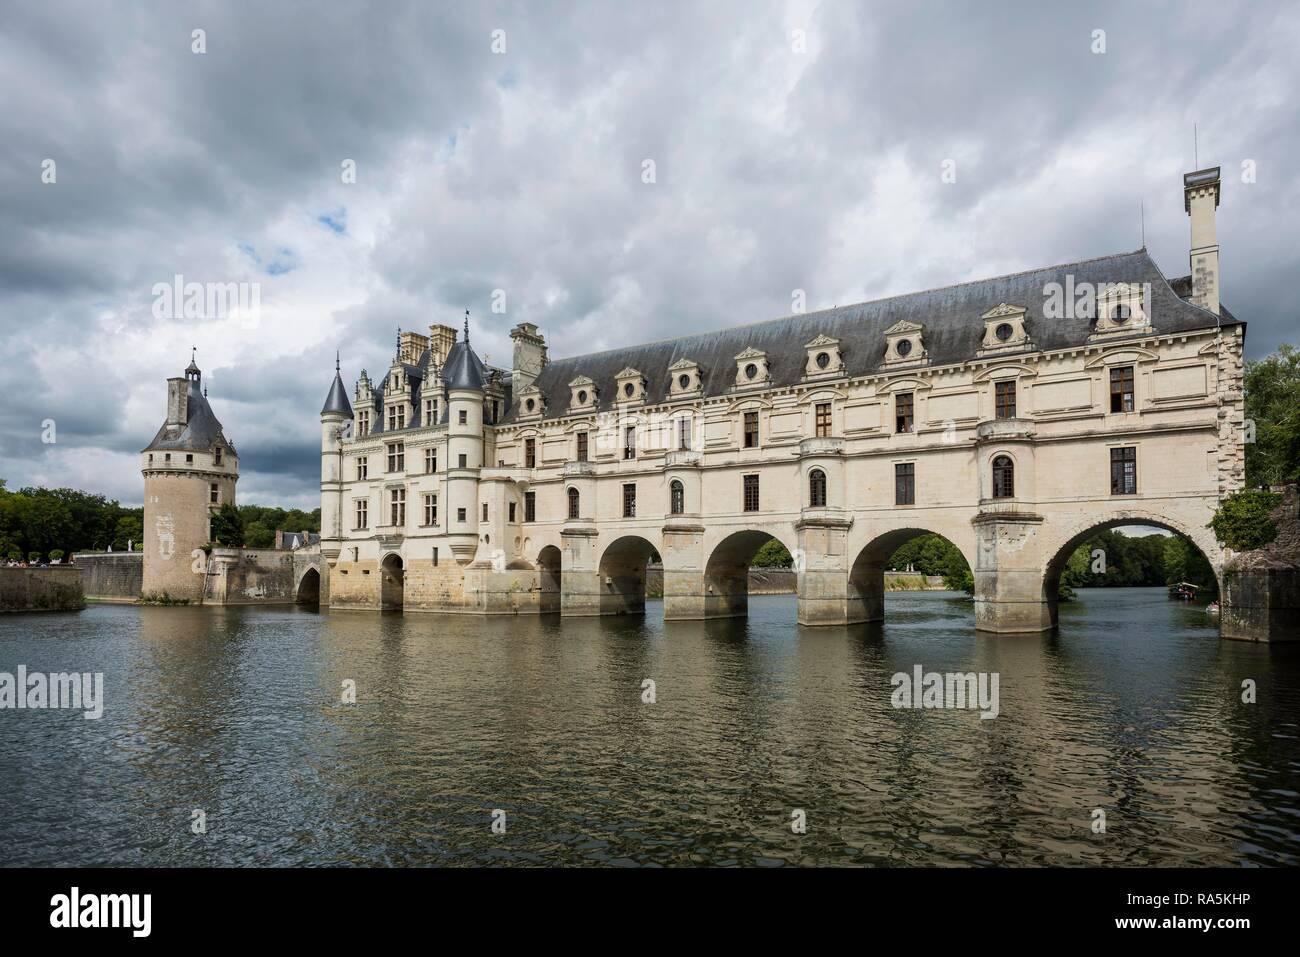 Castillo de Chenonceau el Cher, el Château de Chenonceau, Departamento Chenonceaux, Indre-et-Loire, Región Centro, Francia Imagen De Stock